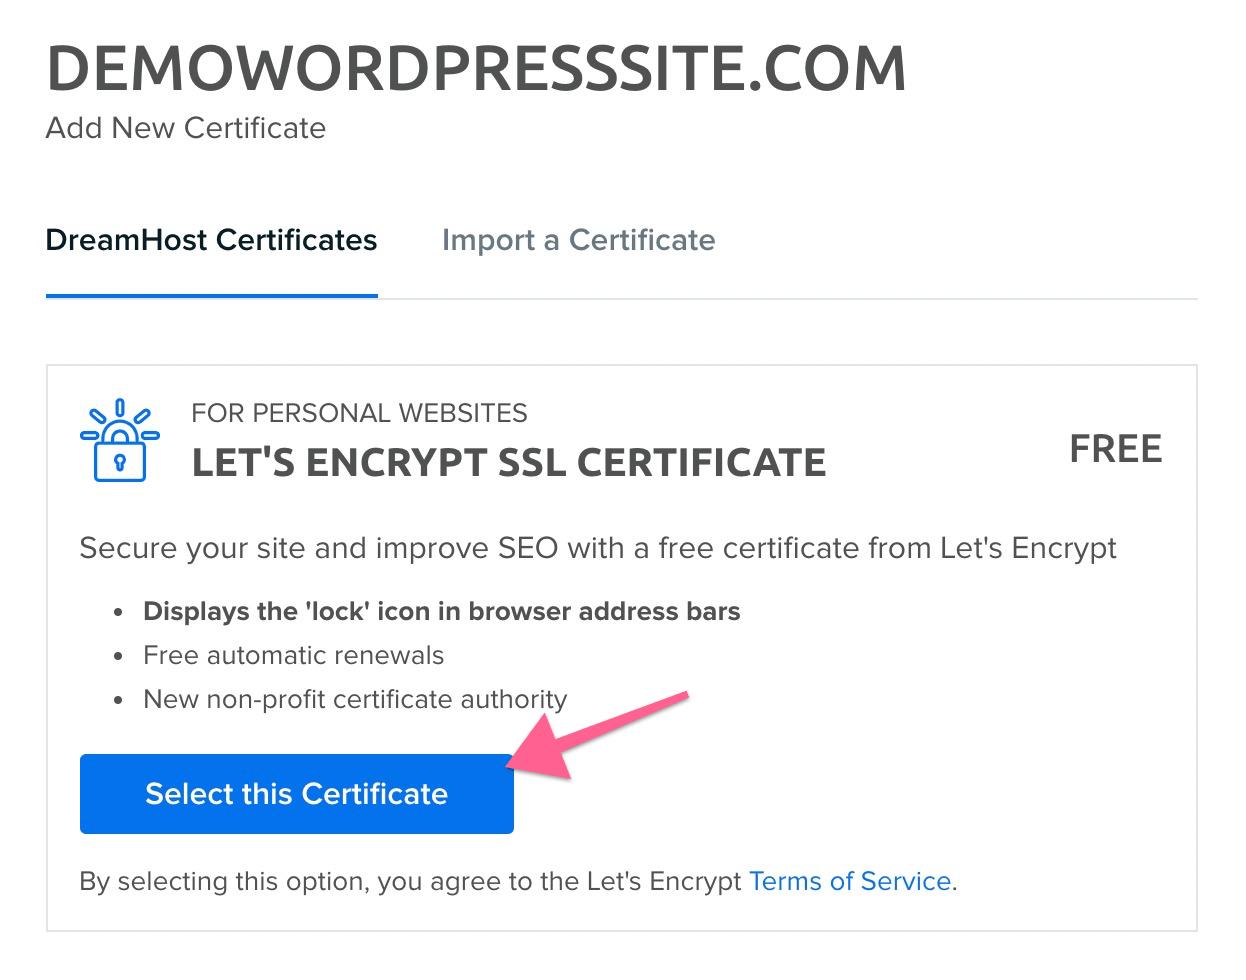 Install the SSL Certificate